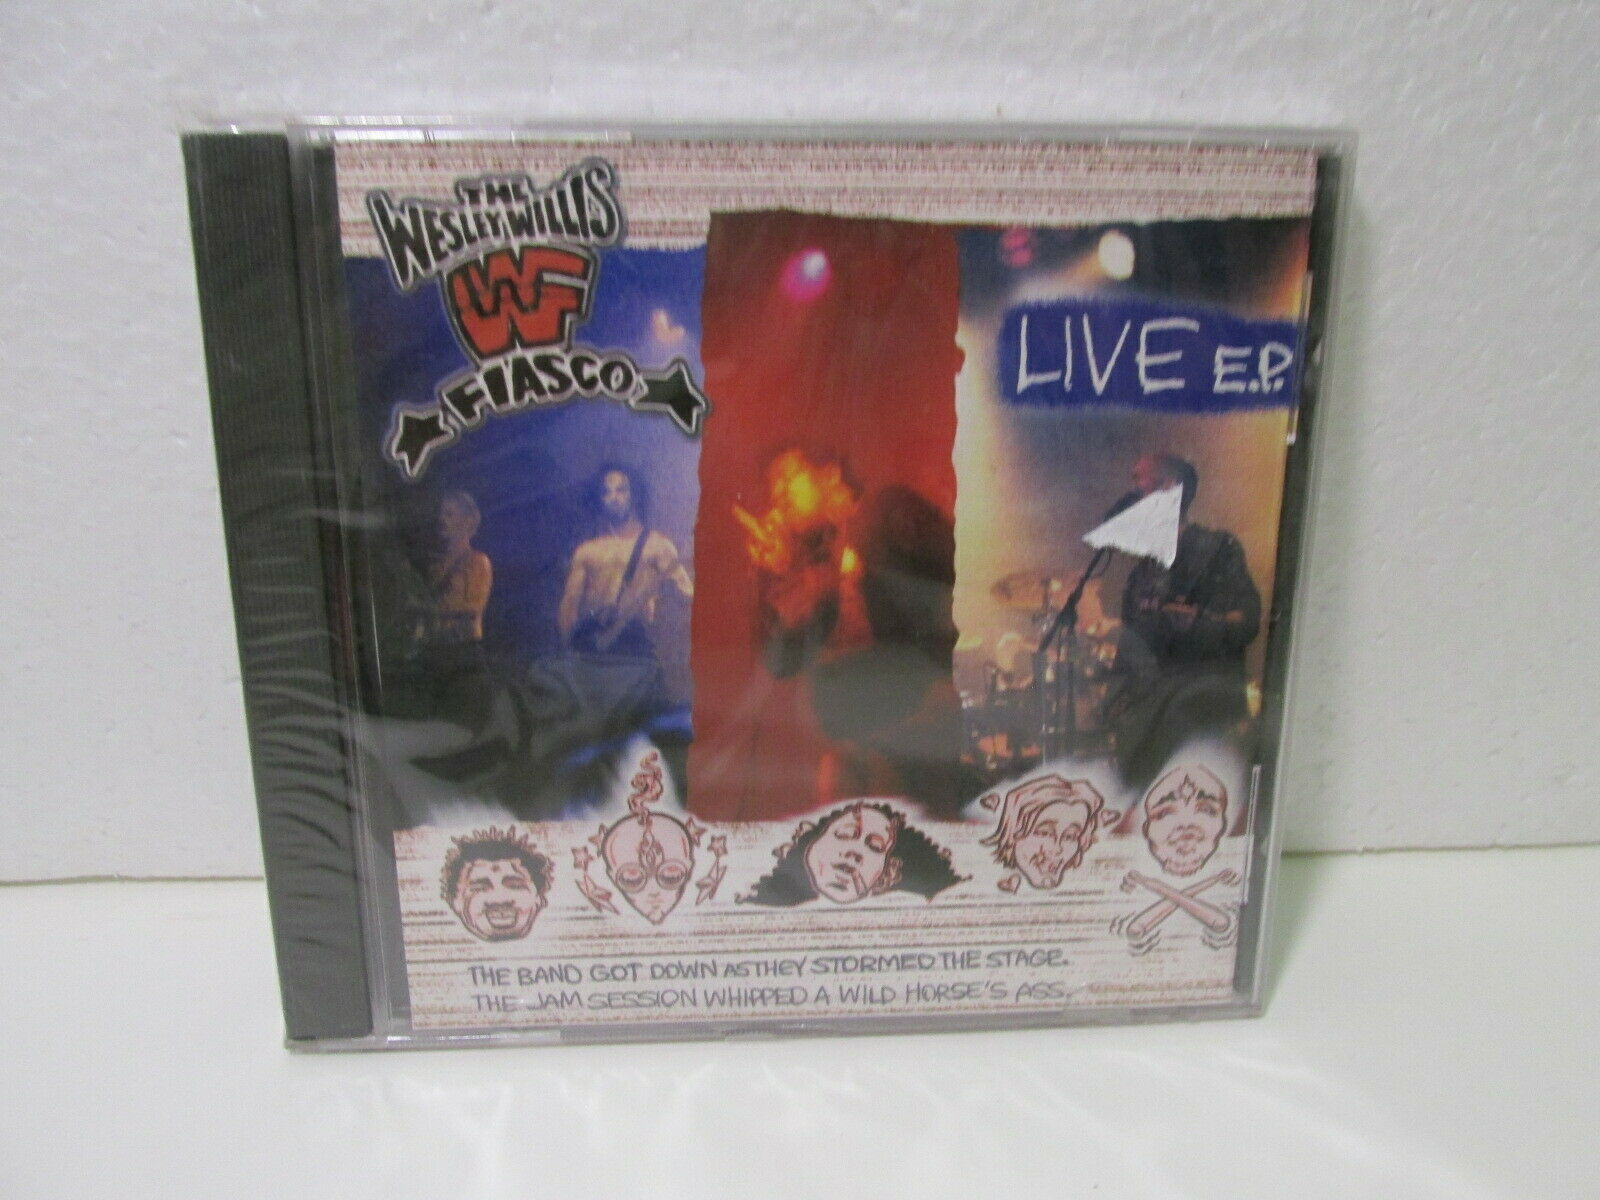 Rare The Wesley Willis Fiasco Live E P 2001 Cd10721 For Sale Online